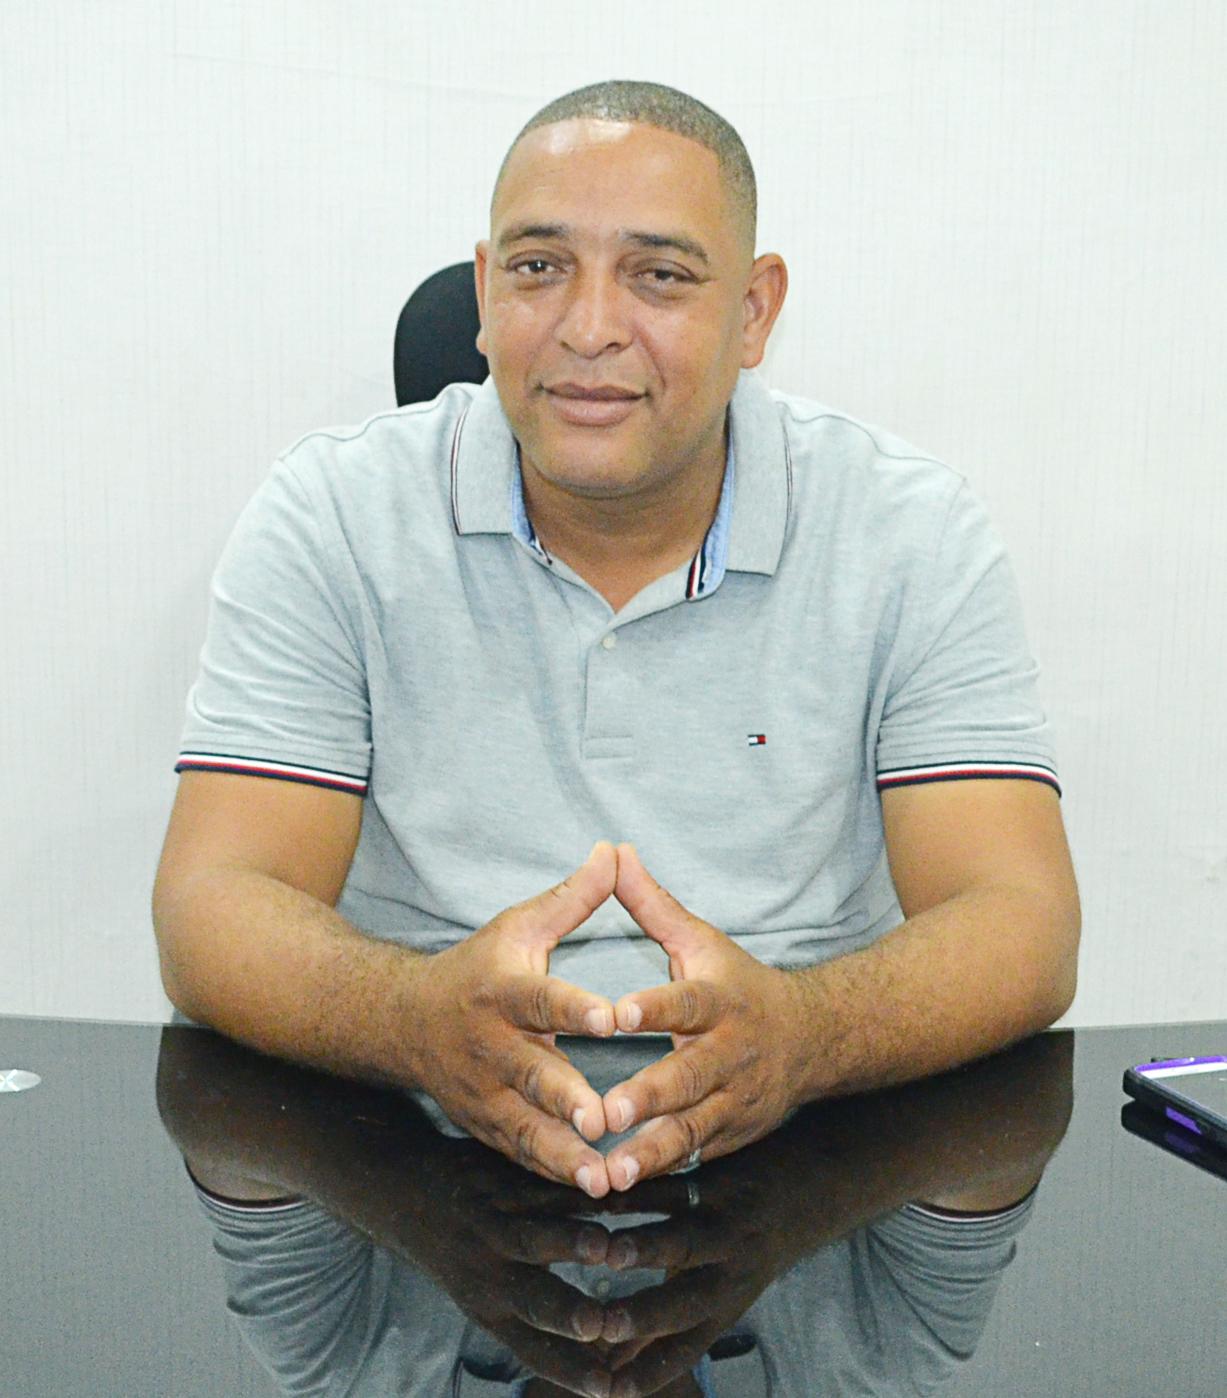 Félix Vargas (Quequi), director de Agenda 56